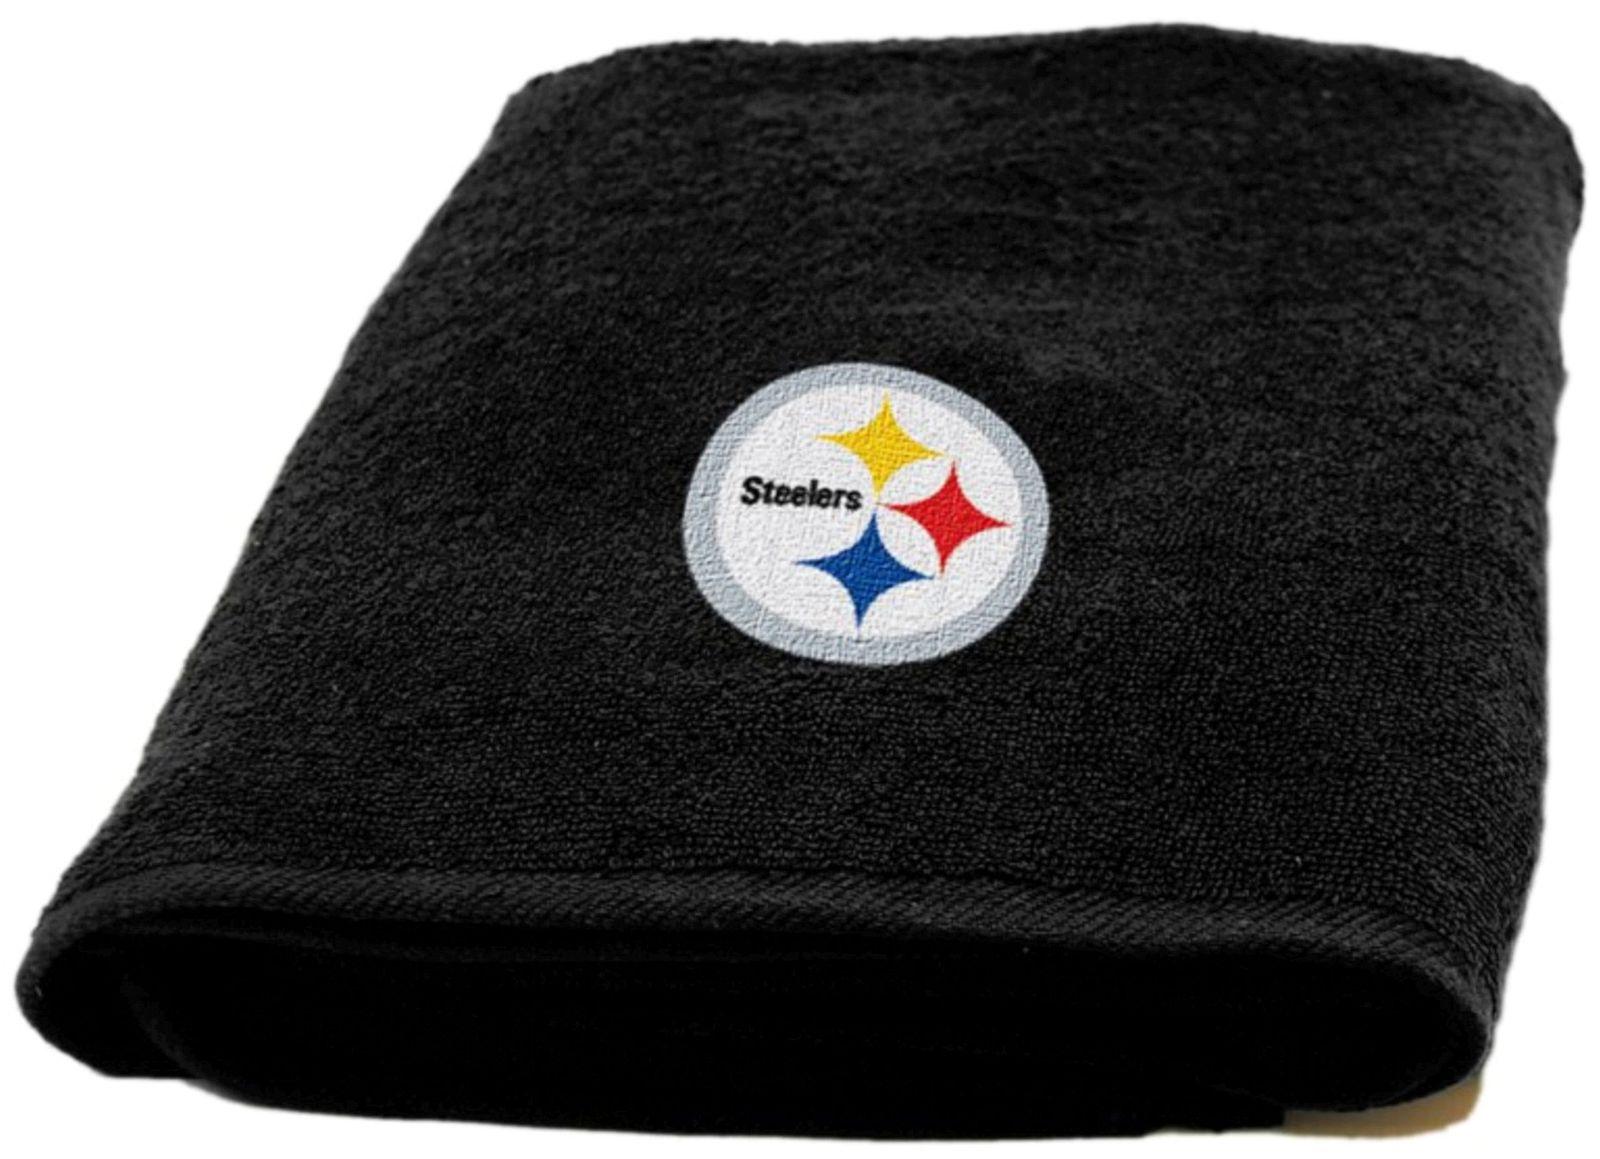 Pittsburgh steelers bath towel   25 x 50   walmart    8.88